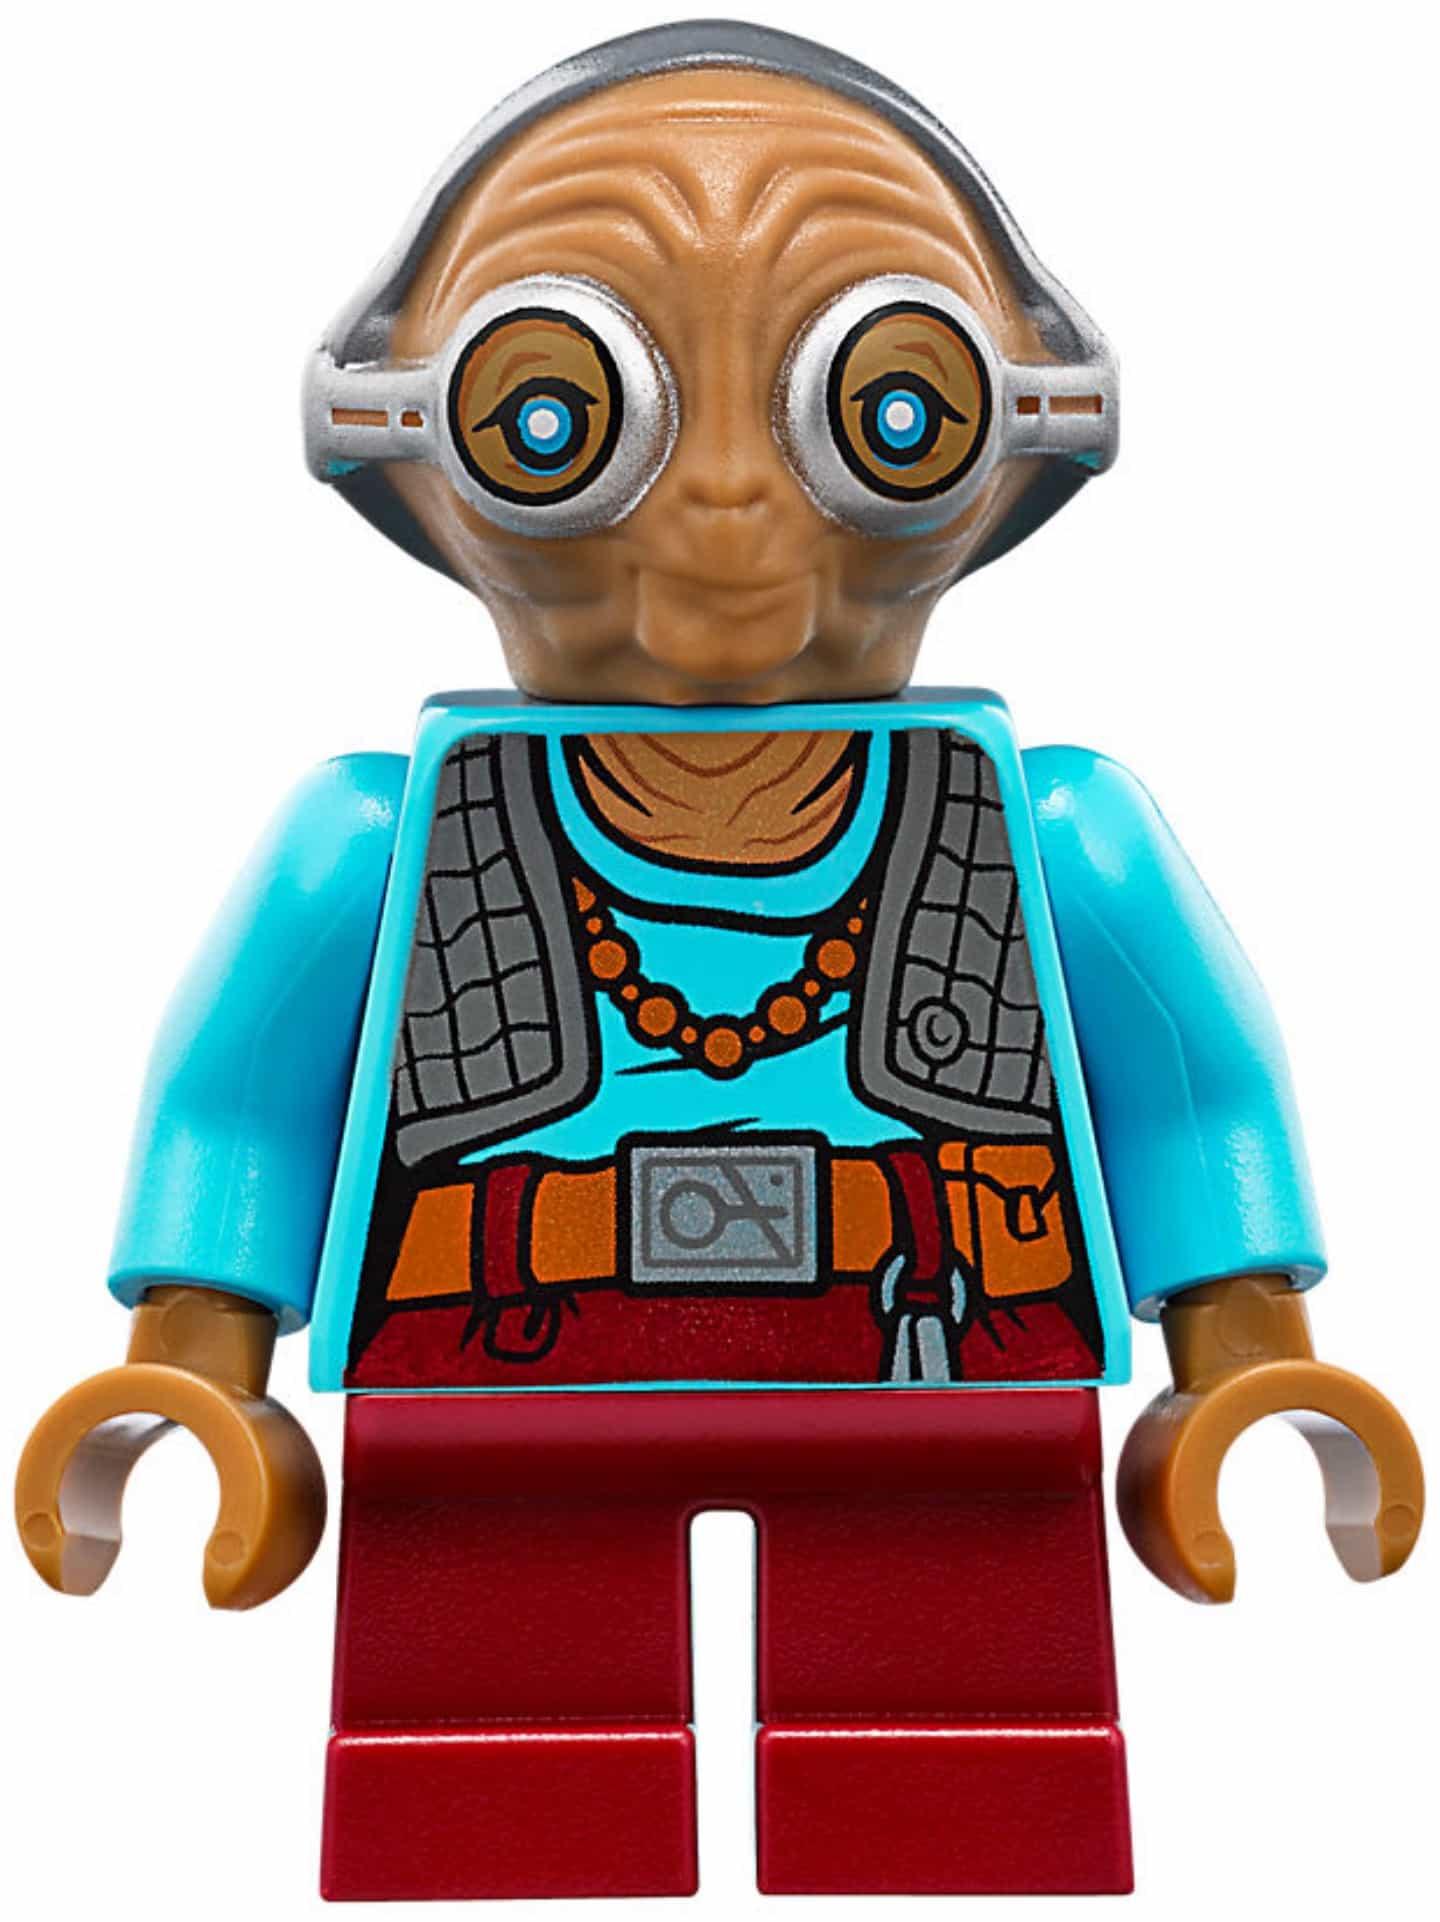 Lego star wars minifigure review 75139 powerofthebrick - Image star wars lego ...